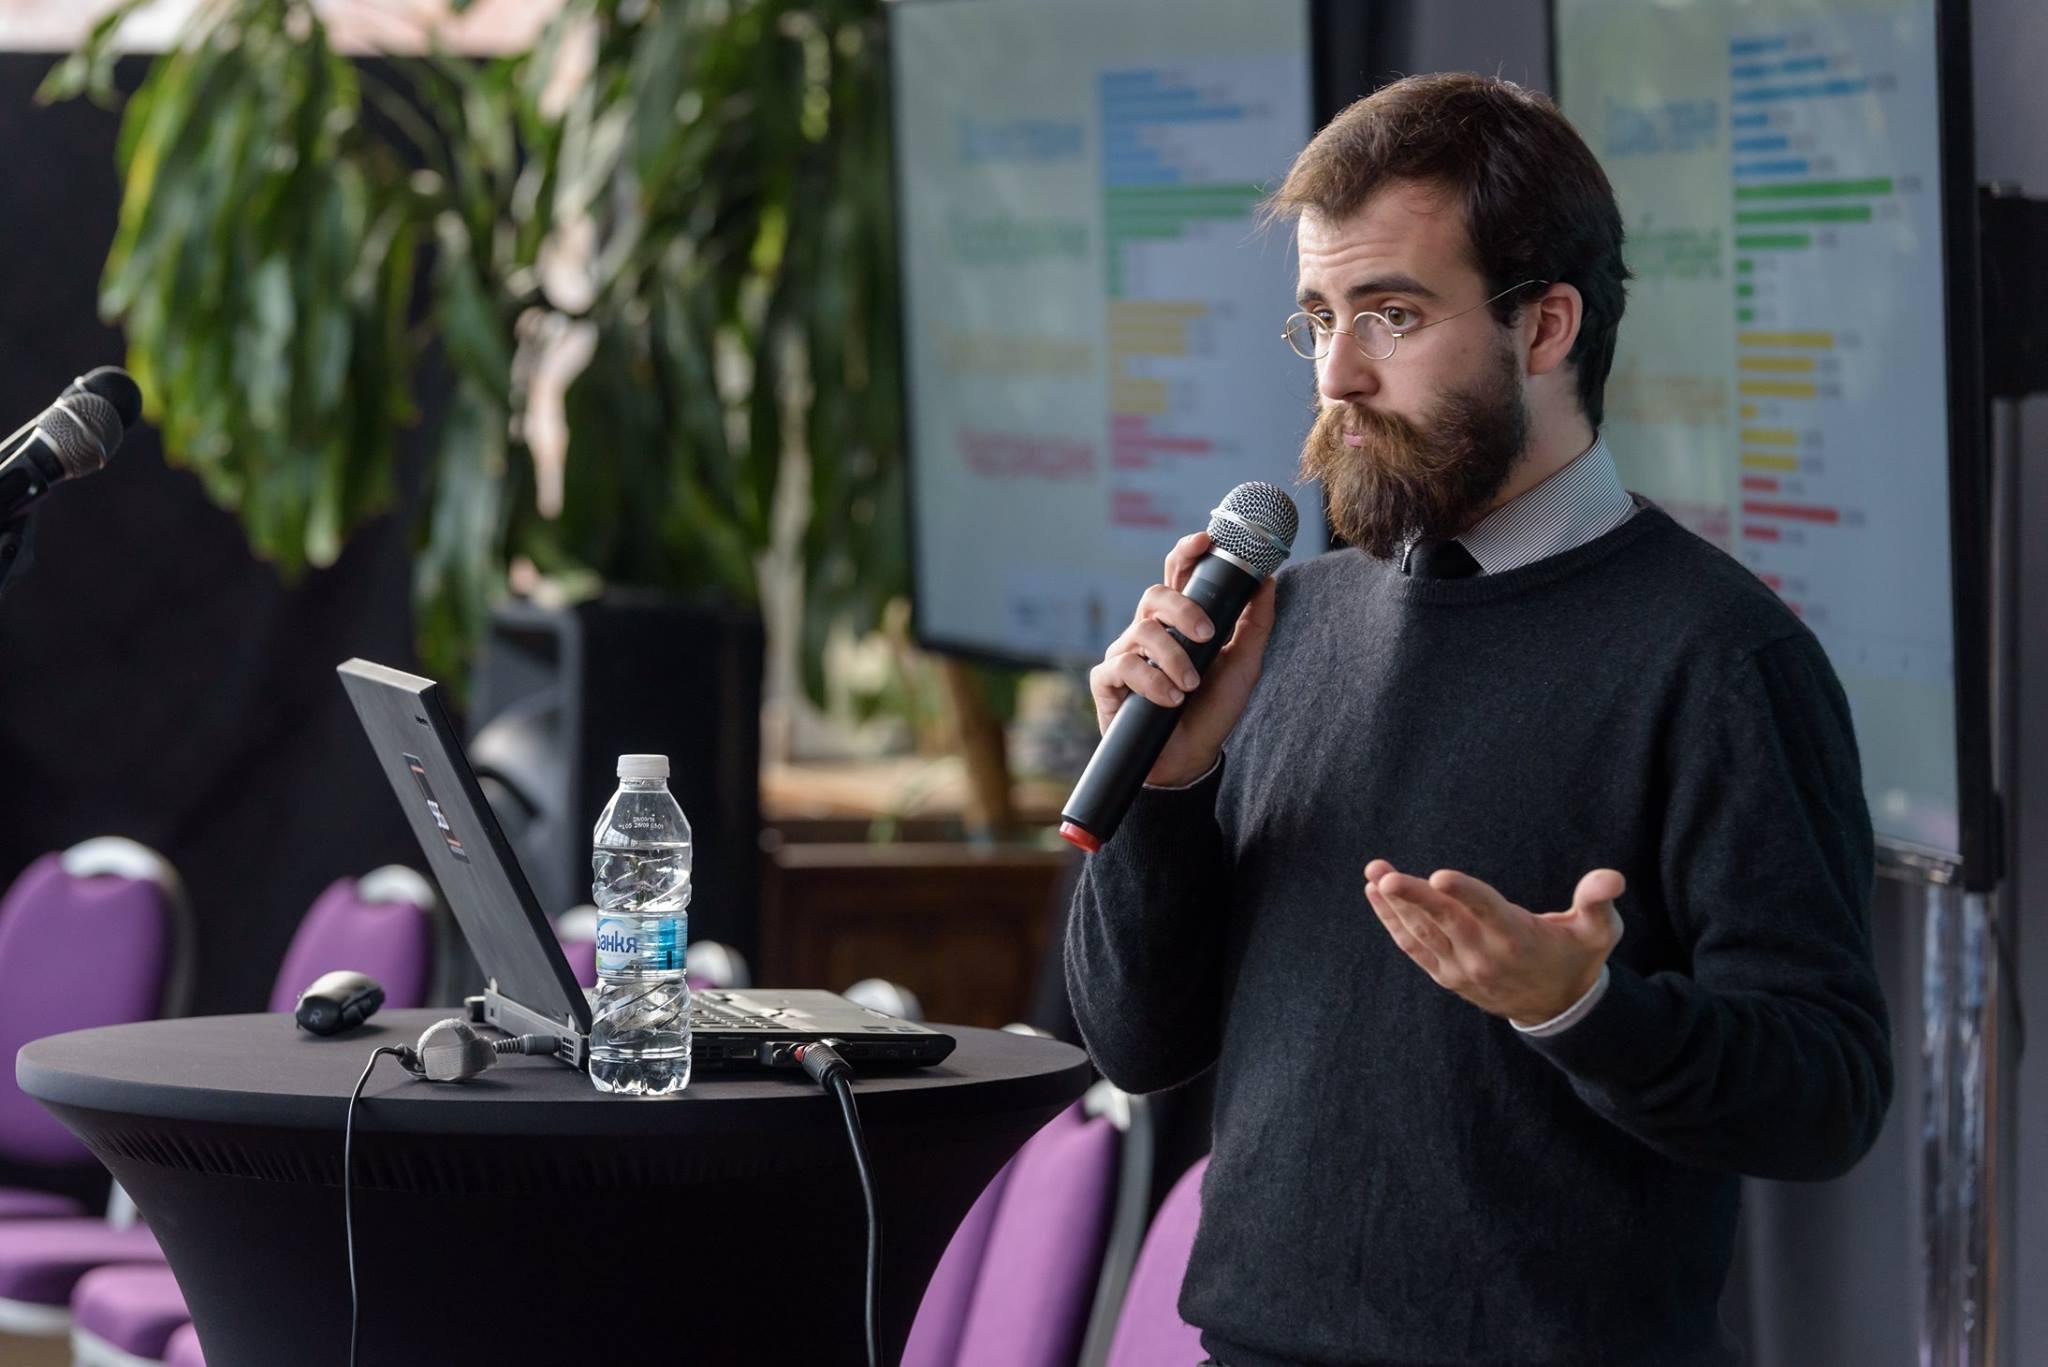 Размисли за образованието – разговор с Иван Господинов [аудио]